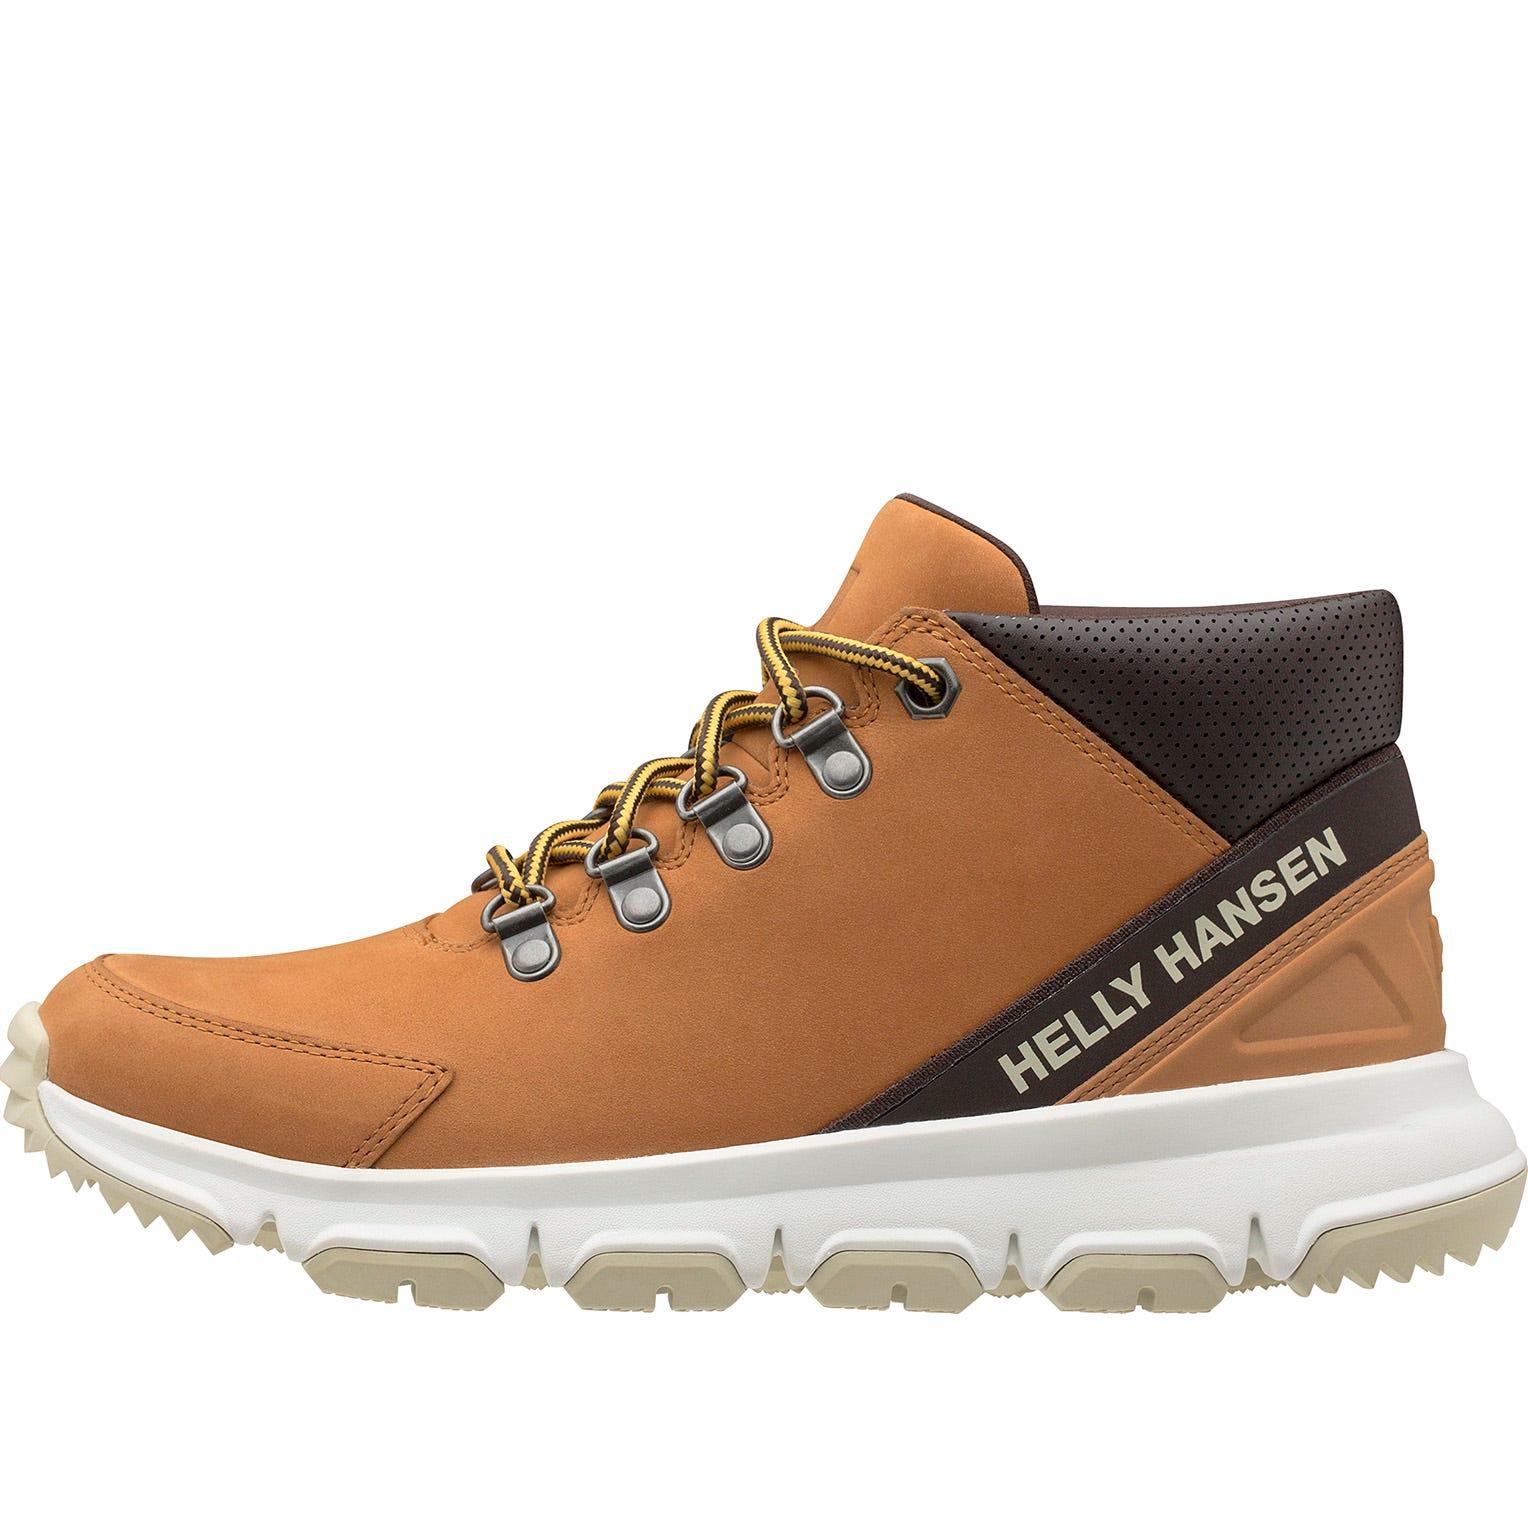 Helly Hansen W Fendvard Boot Womens Casual Shoe Brown 6.5